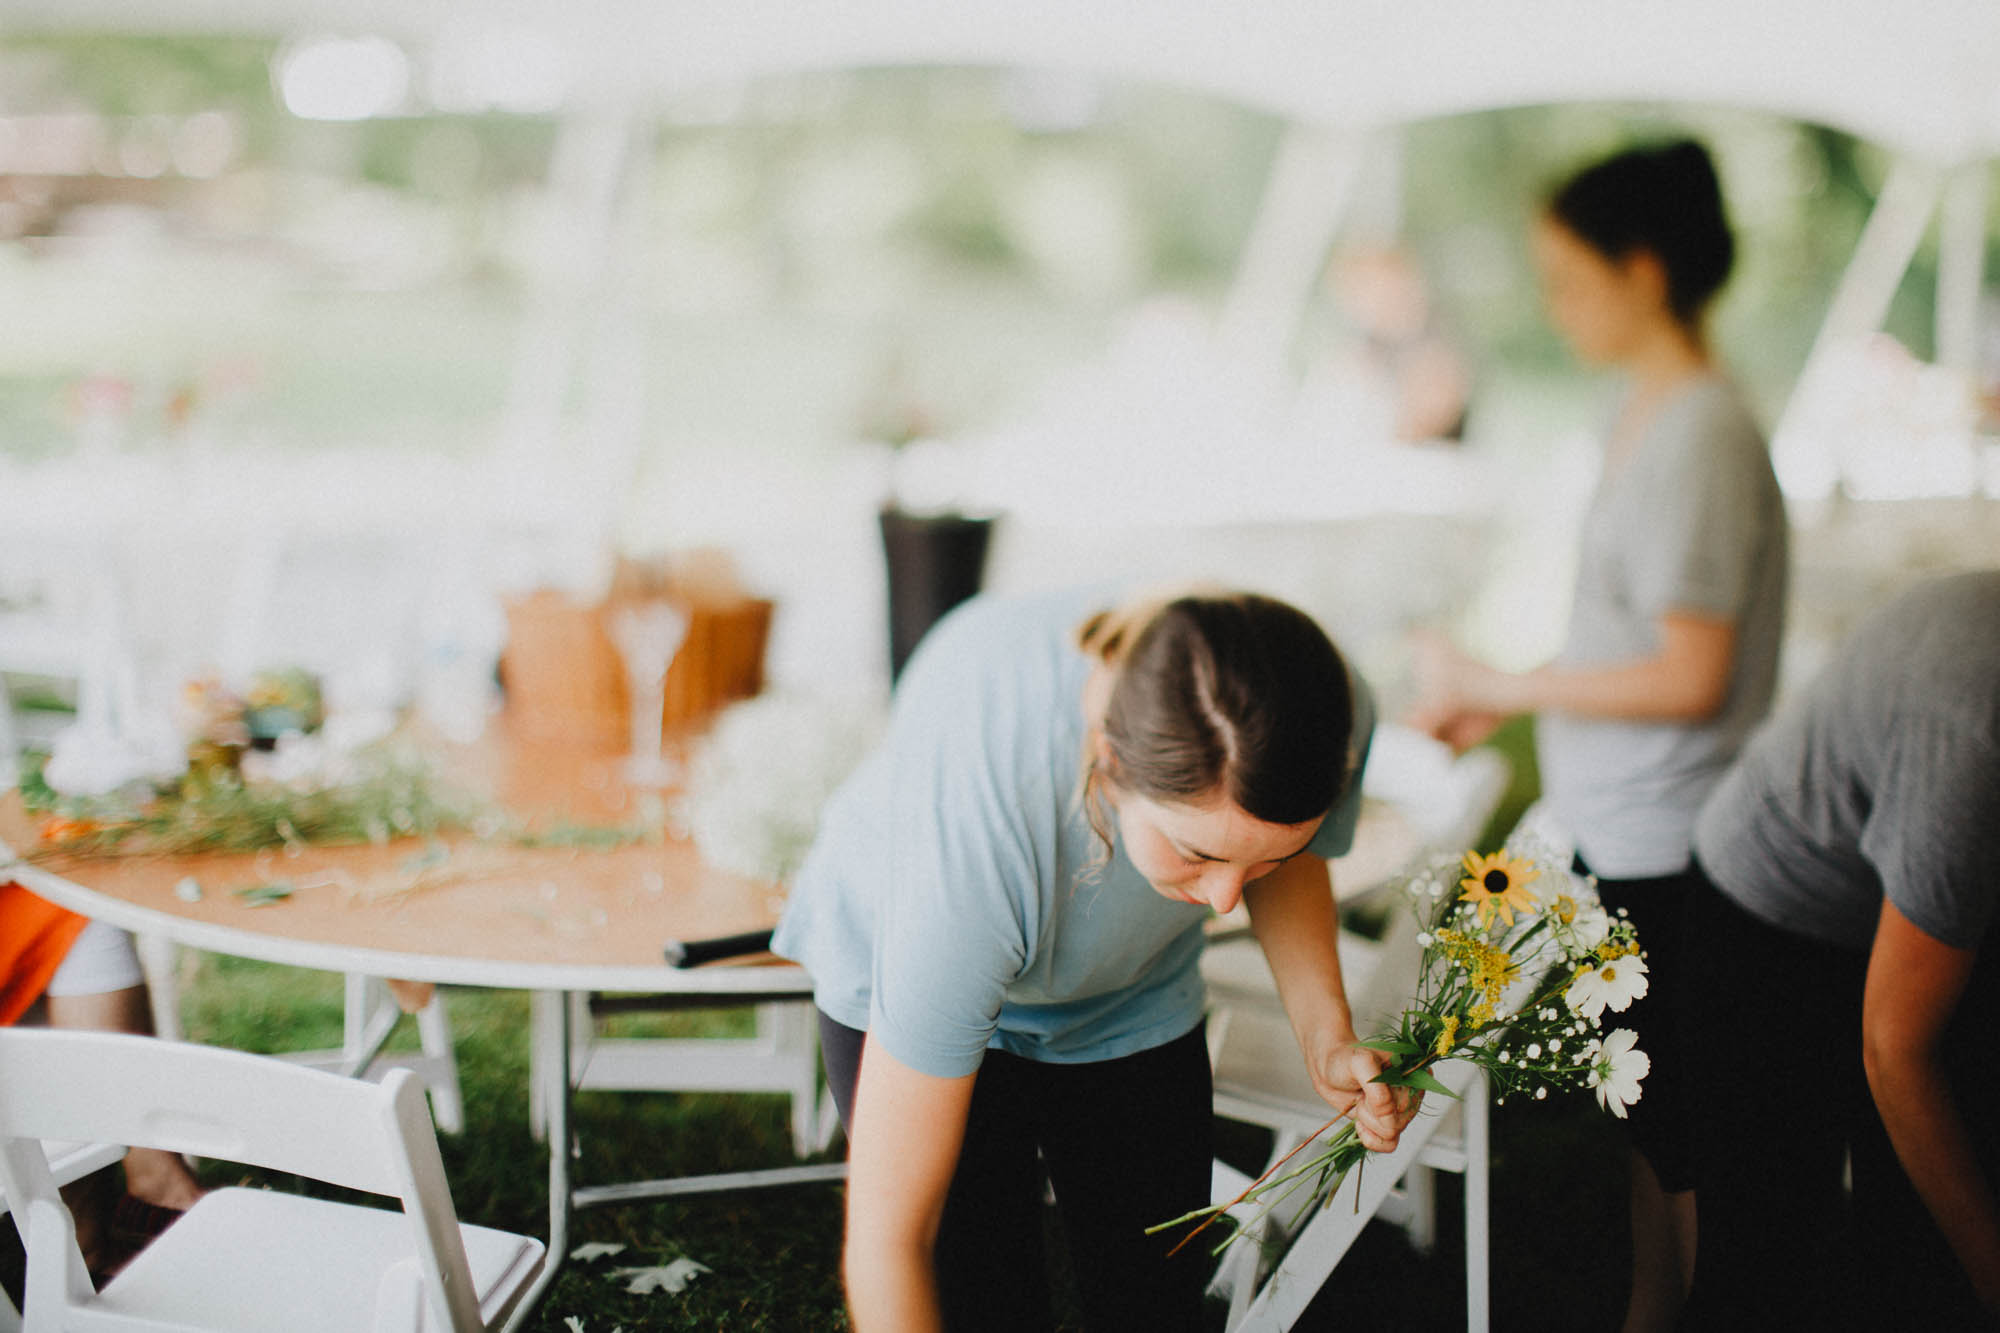 Leah-Graham-Michigan-Outdoor-DIY-Wedding-007@2x.jpg